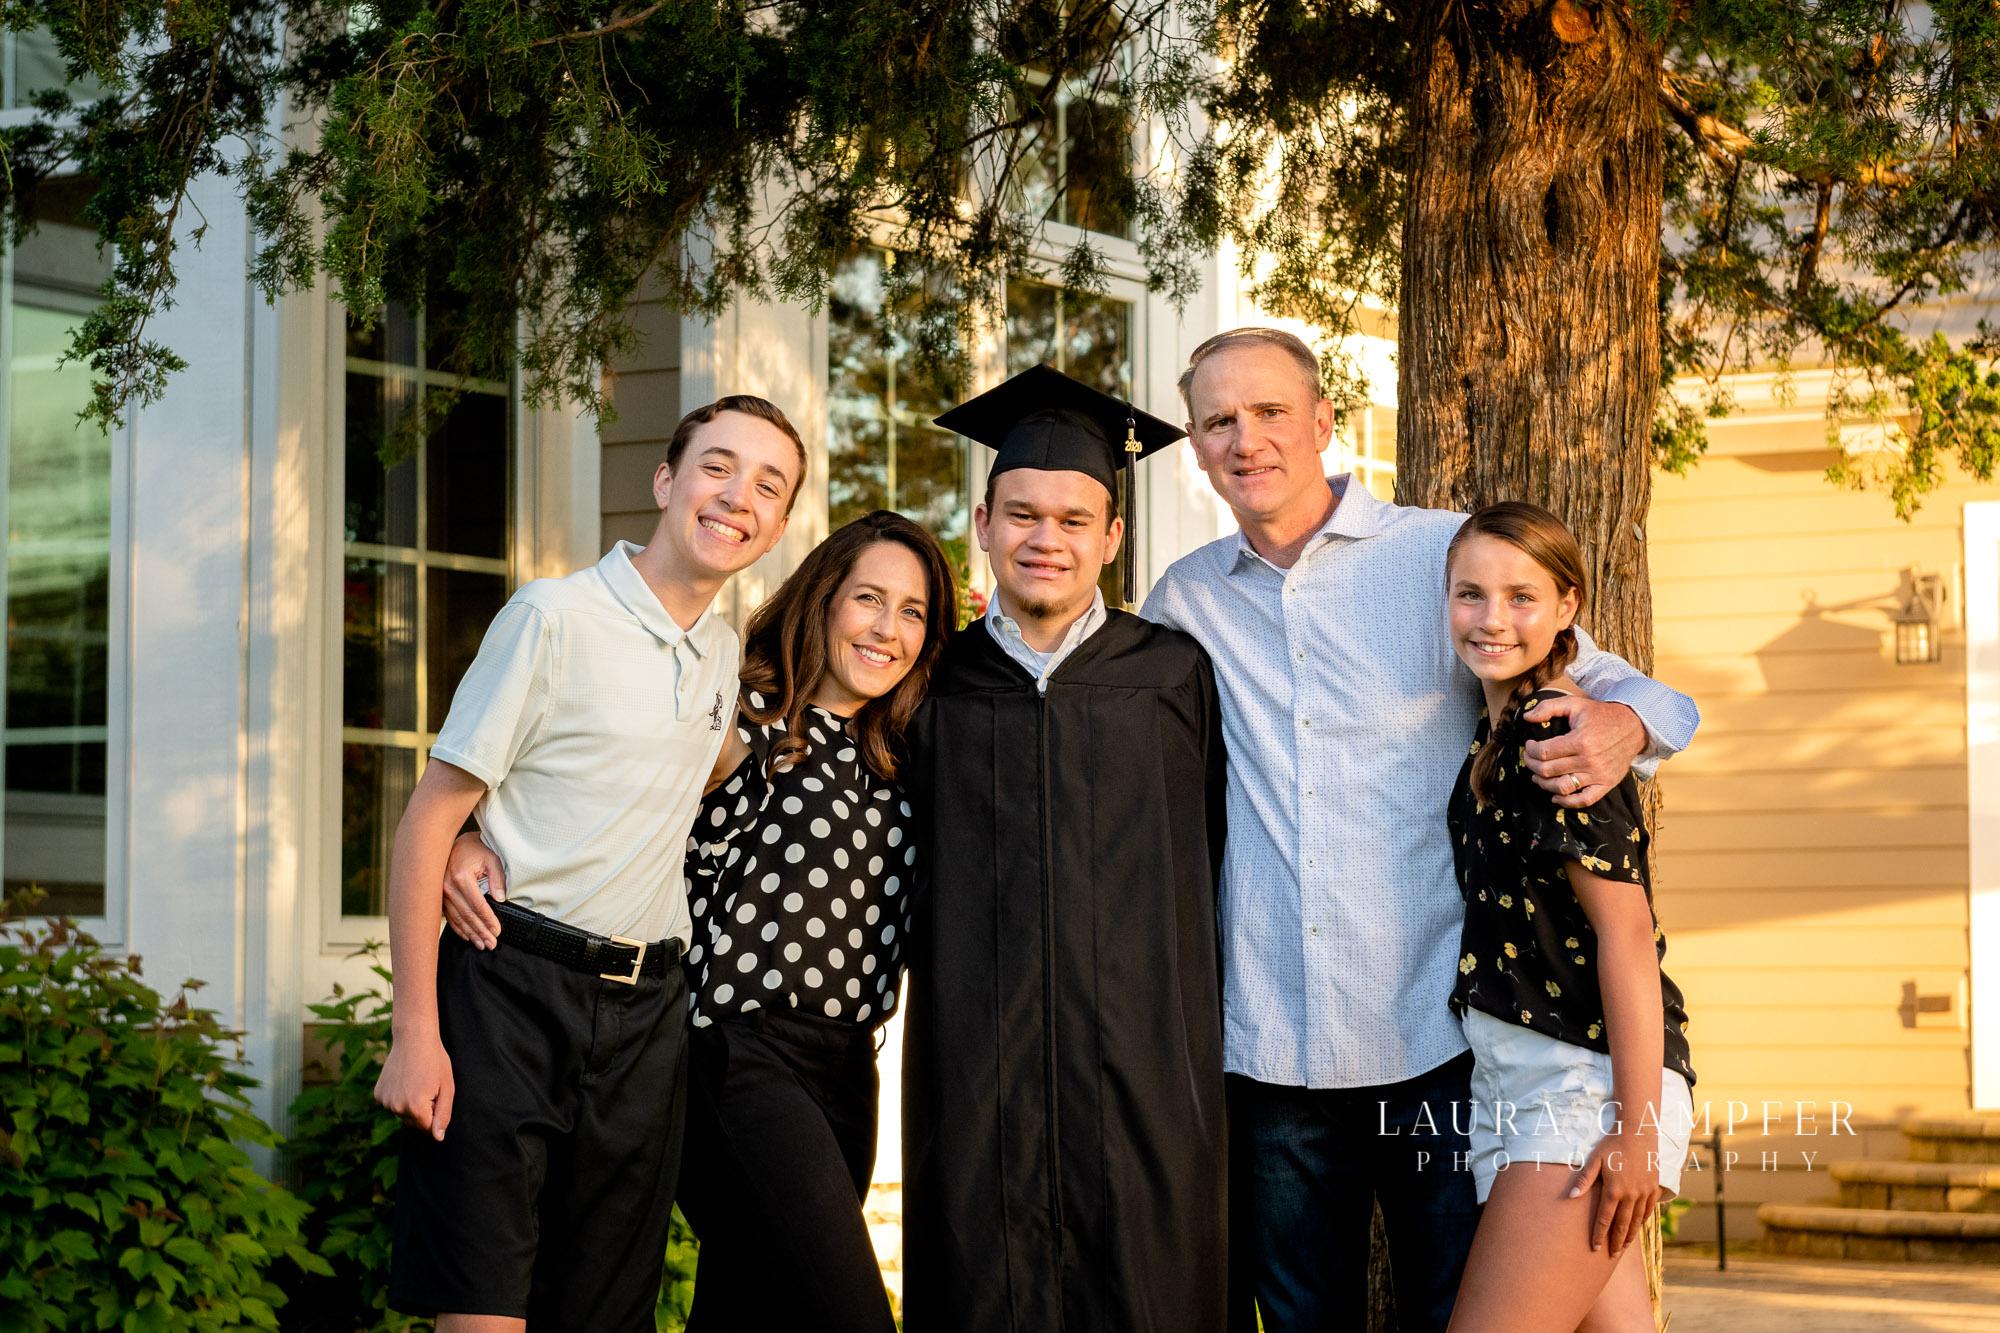 graduation photographer kane dekalb kendall county